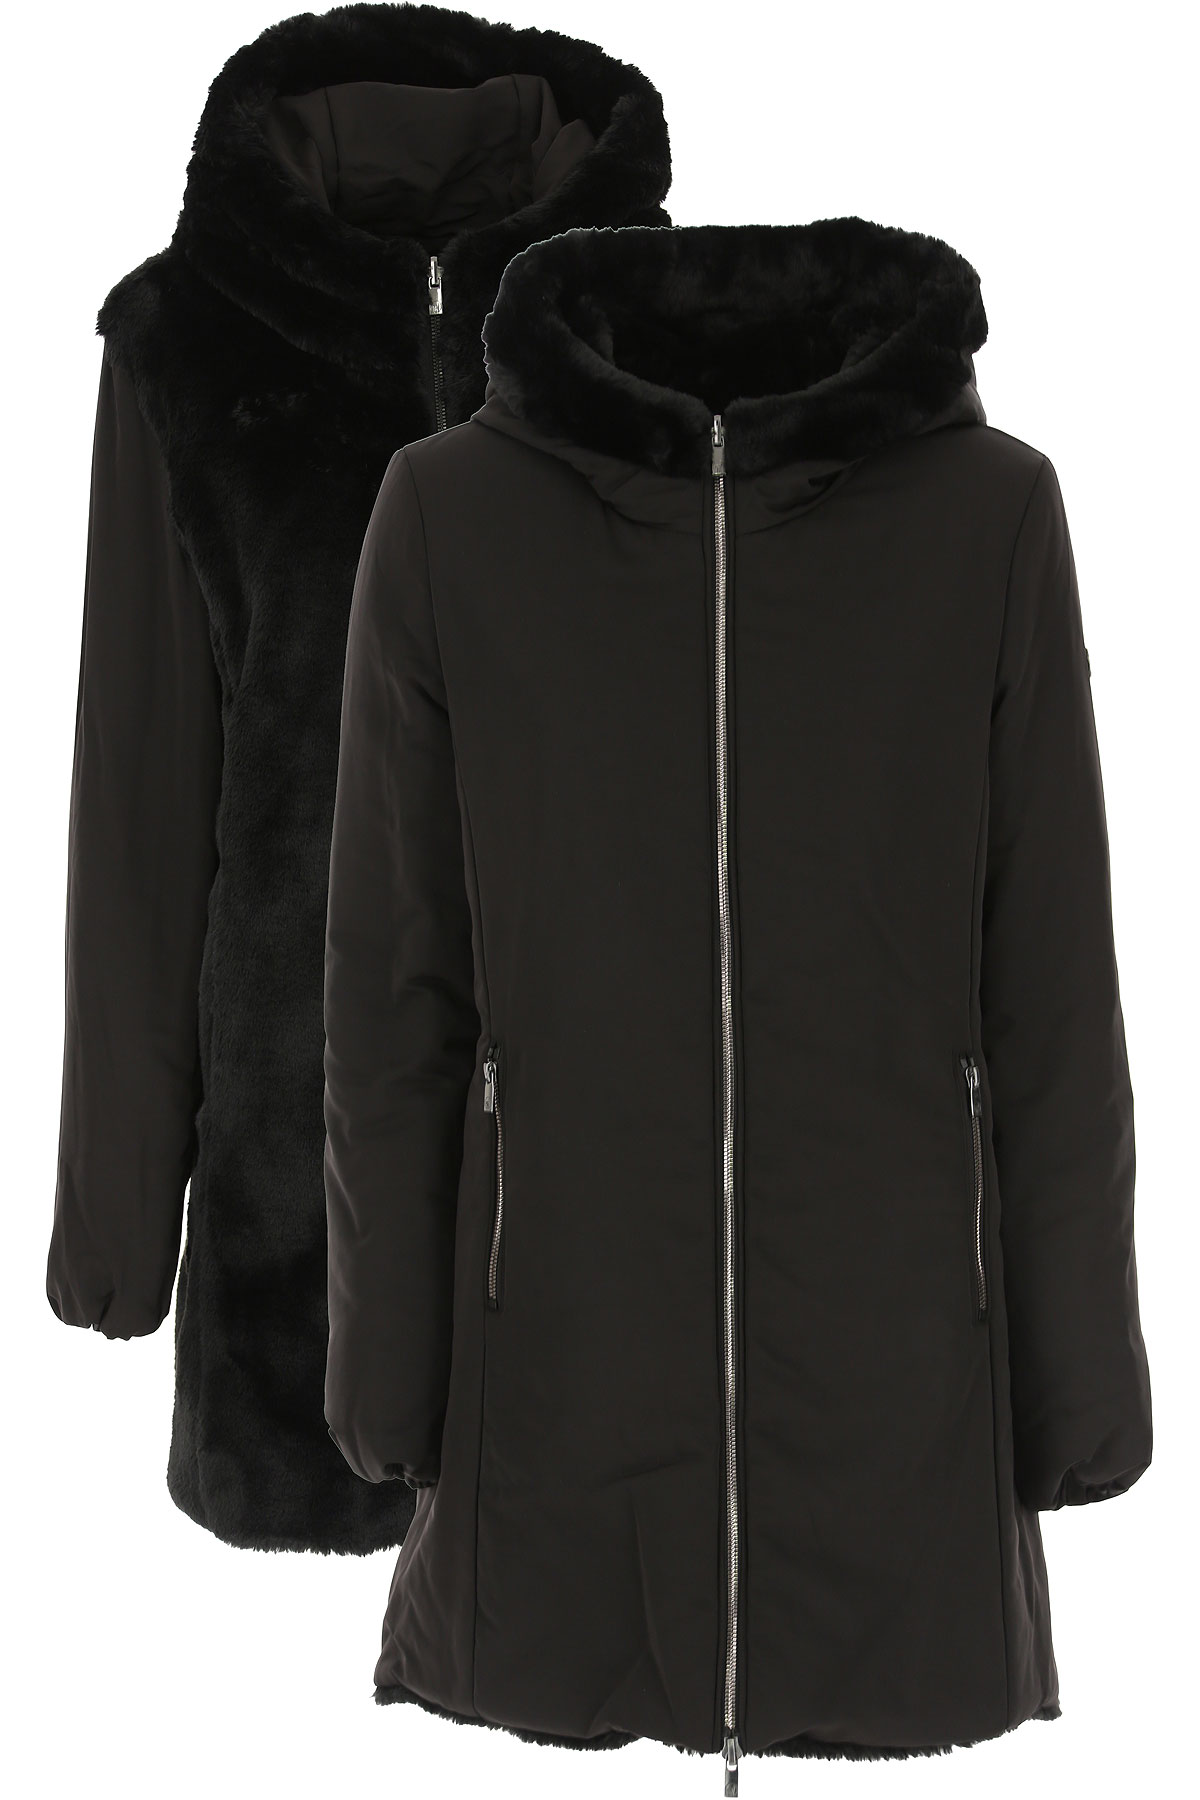 Ciesse Piumini Down Jacket for Women, Puffer Ski Jacket On Sale, Black, Down, 2019, 6 8